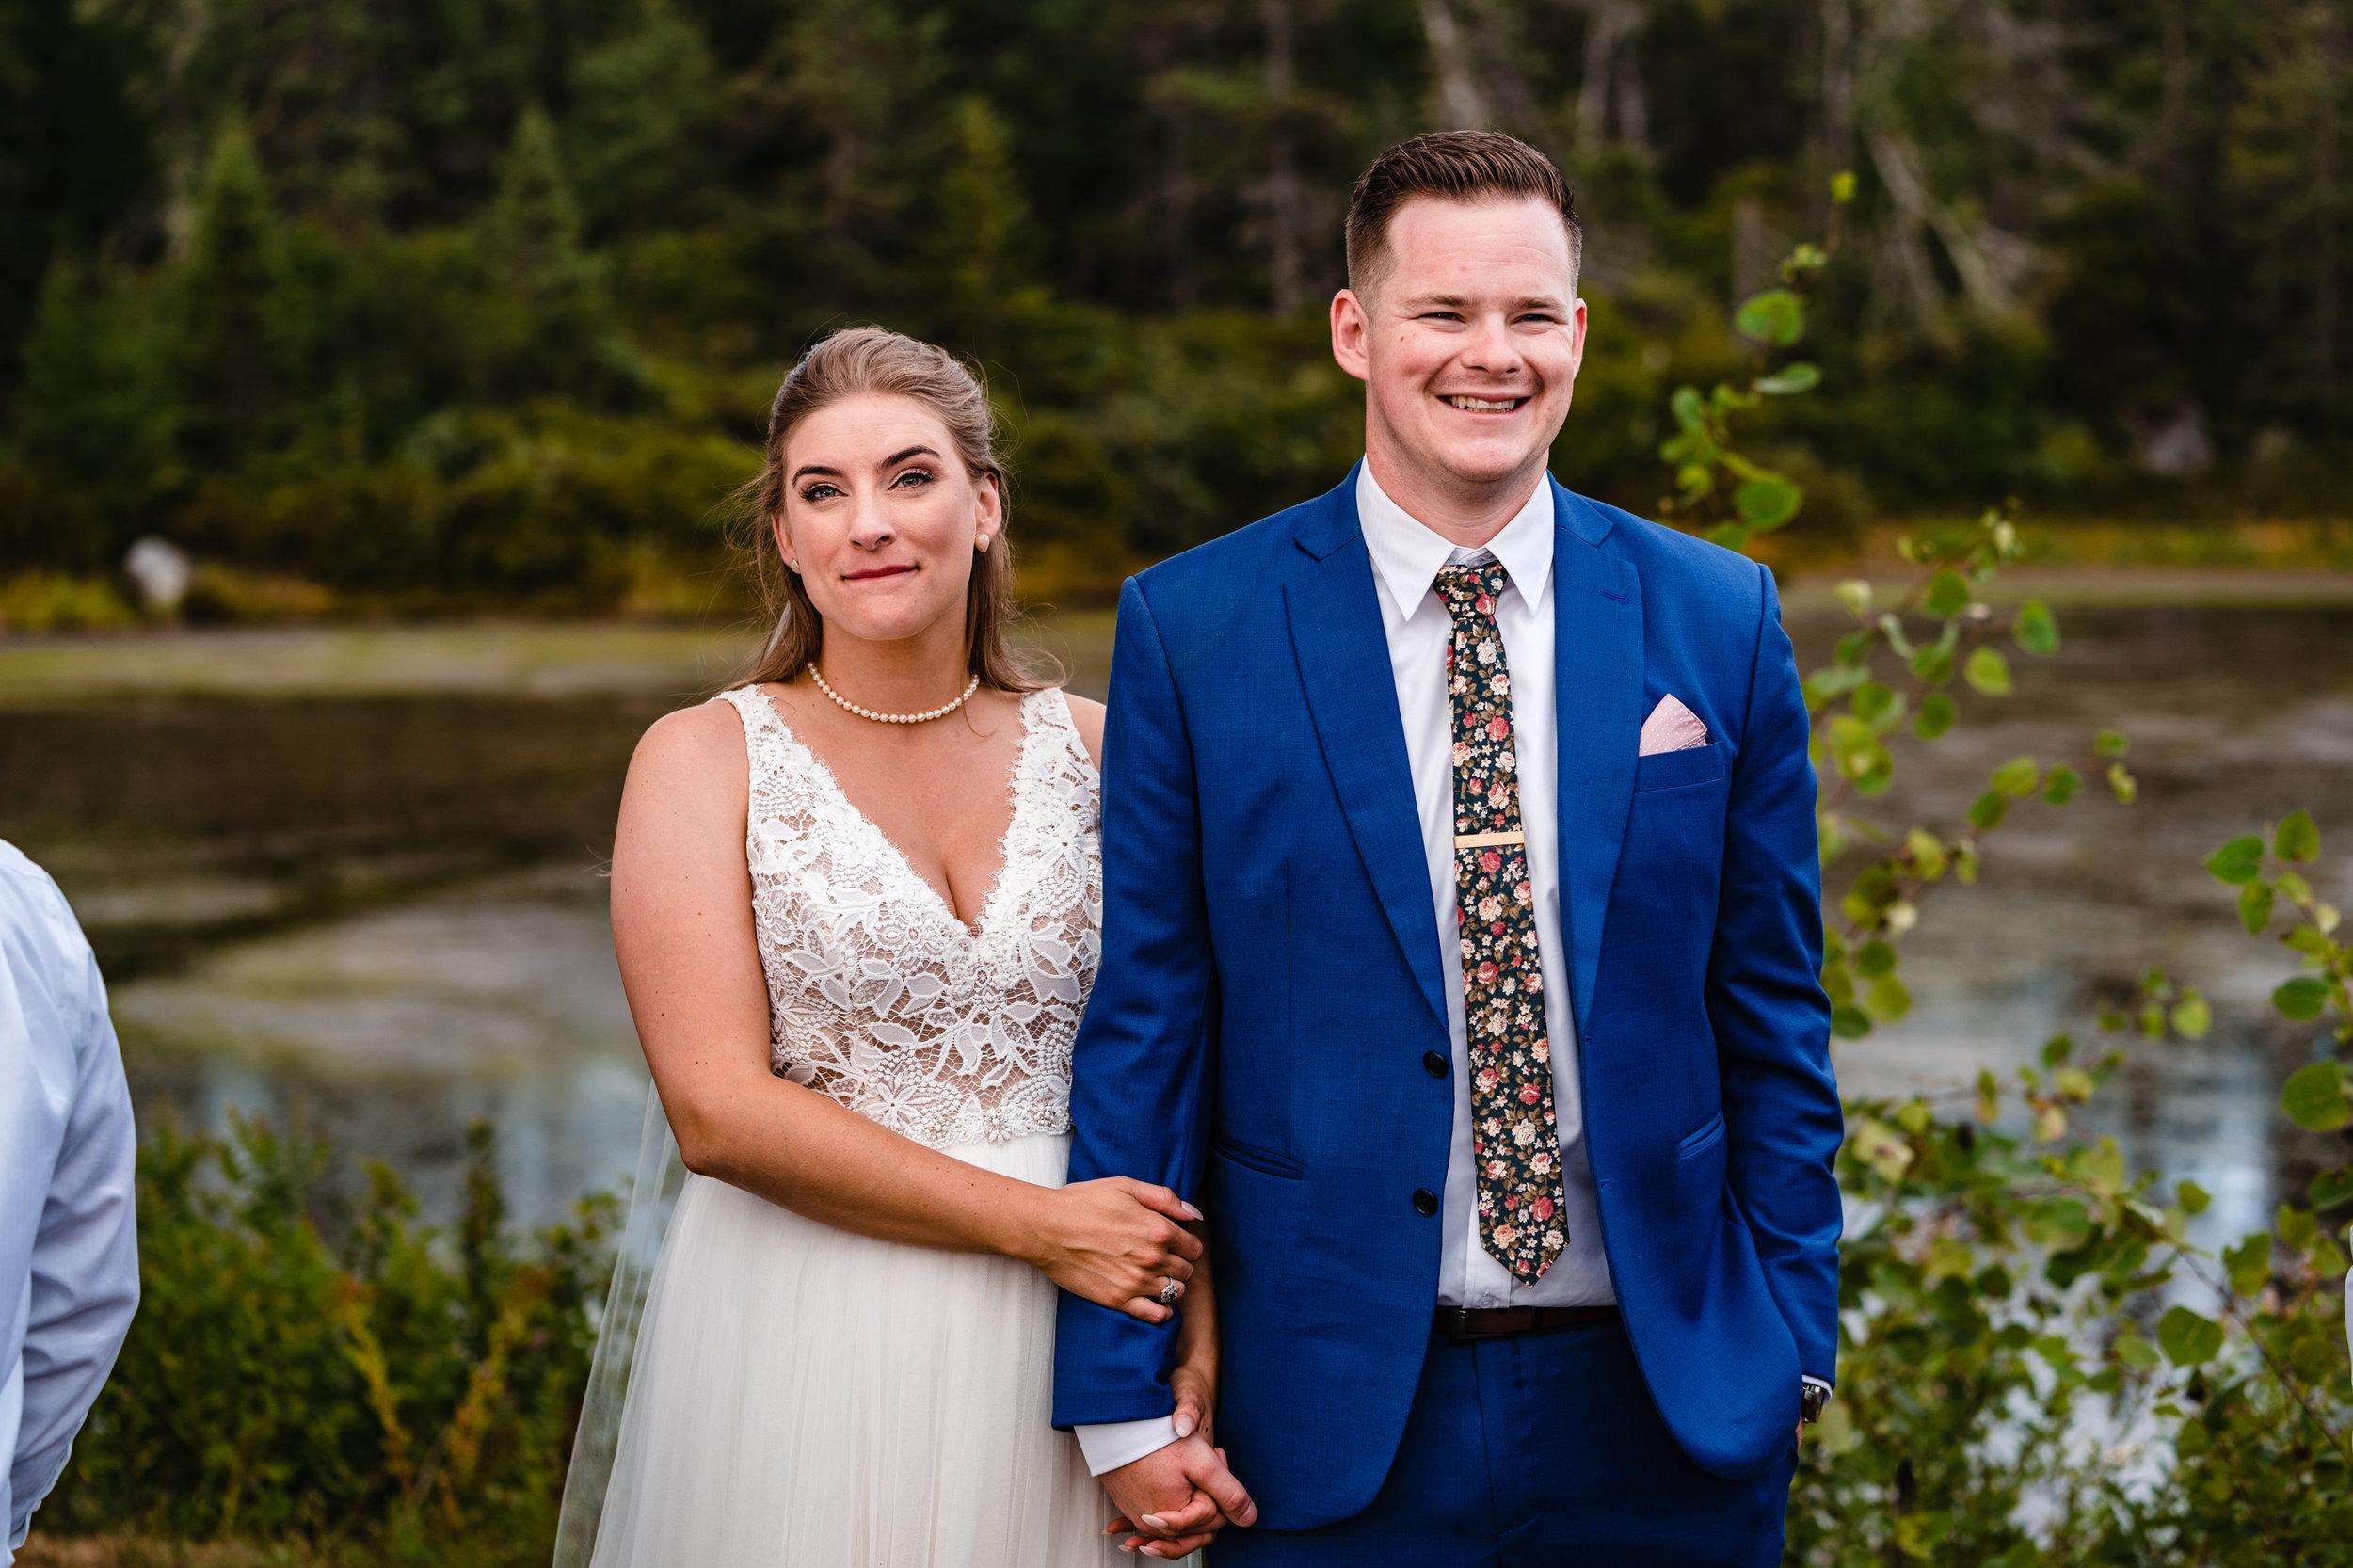 Janelle-Mitch-Halifax-Wedding-Nova-Scotia-Photography (124 of 163).jpg